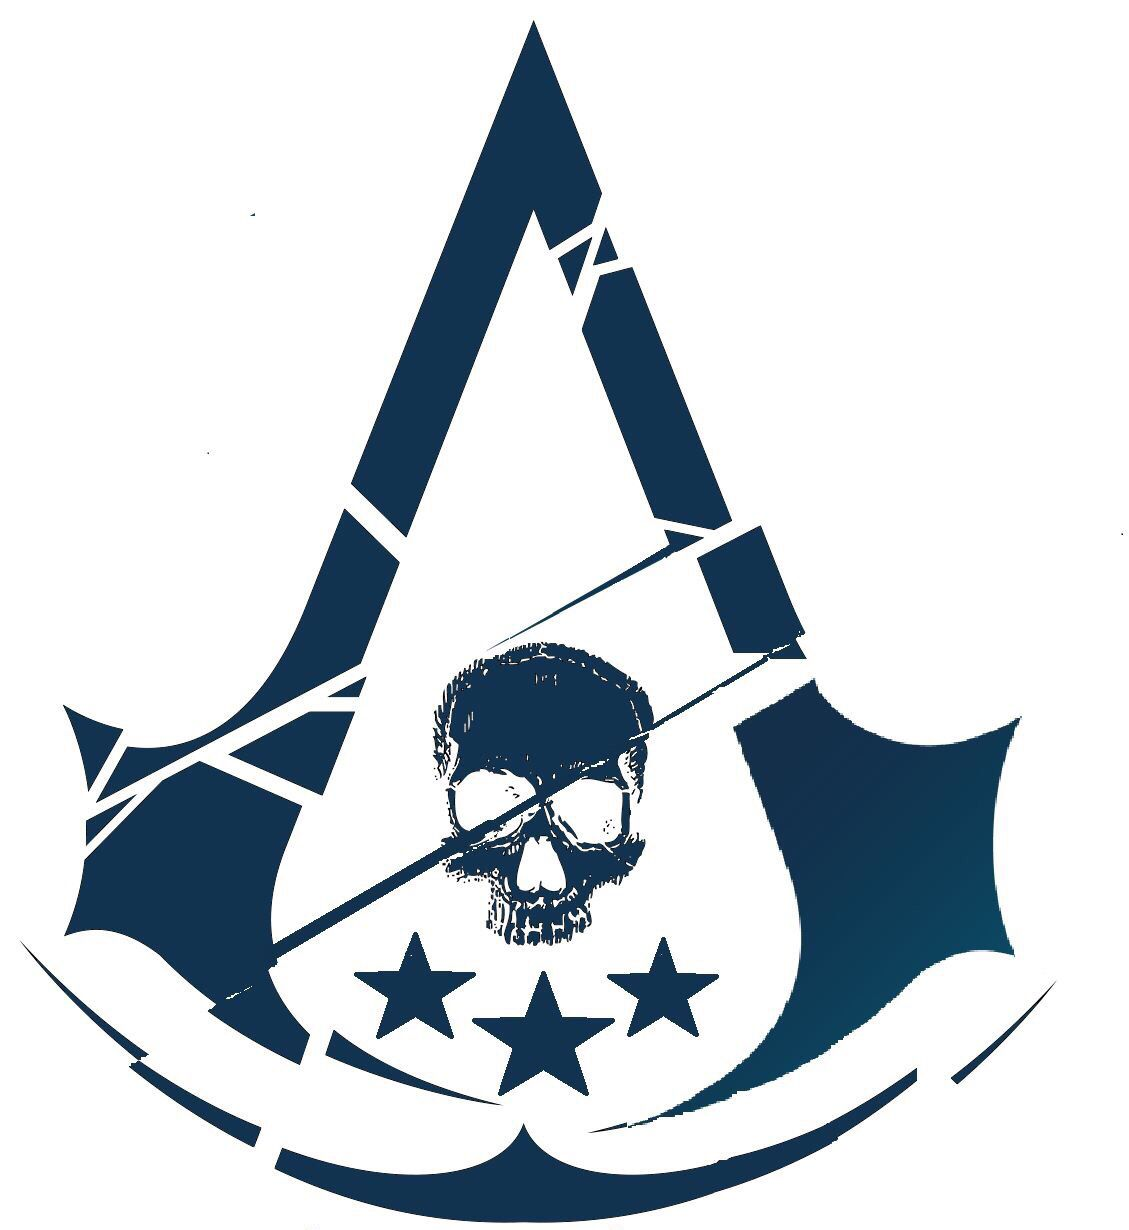 assassins creed merged logos symbols pinterest tattoo ideen stoffe und ideen. Black Bedroom Furniture Sets. Home Design Ideas